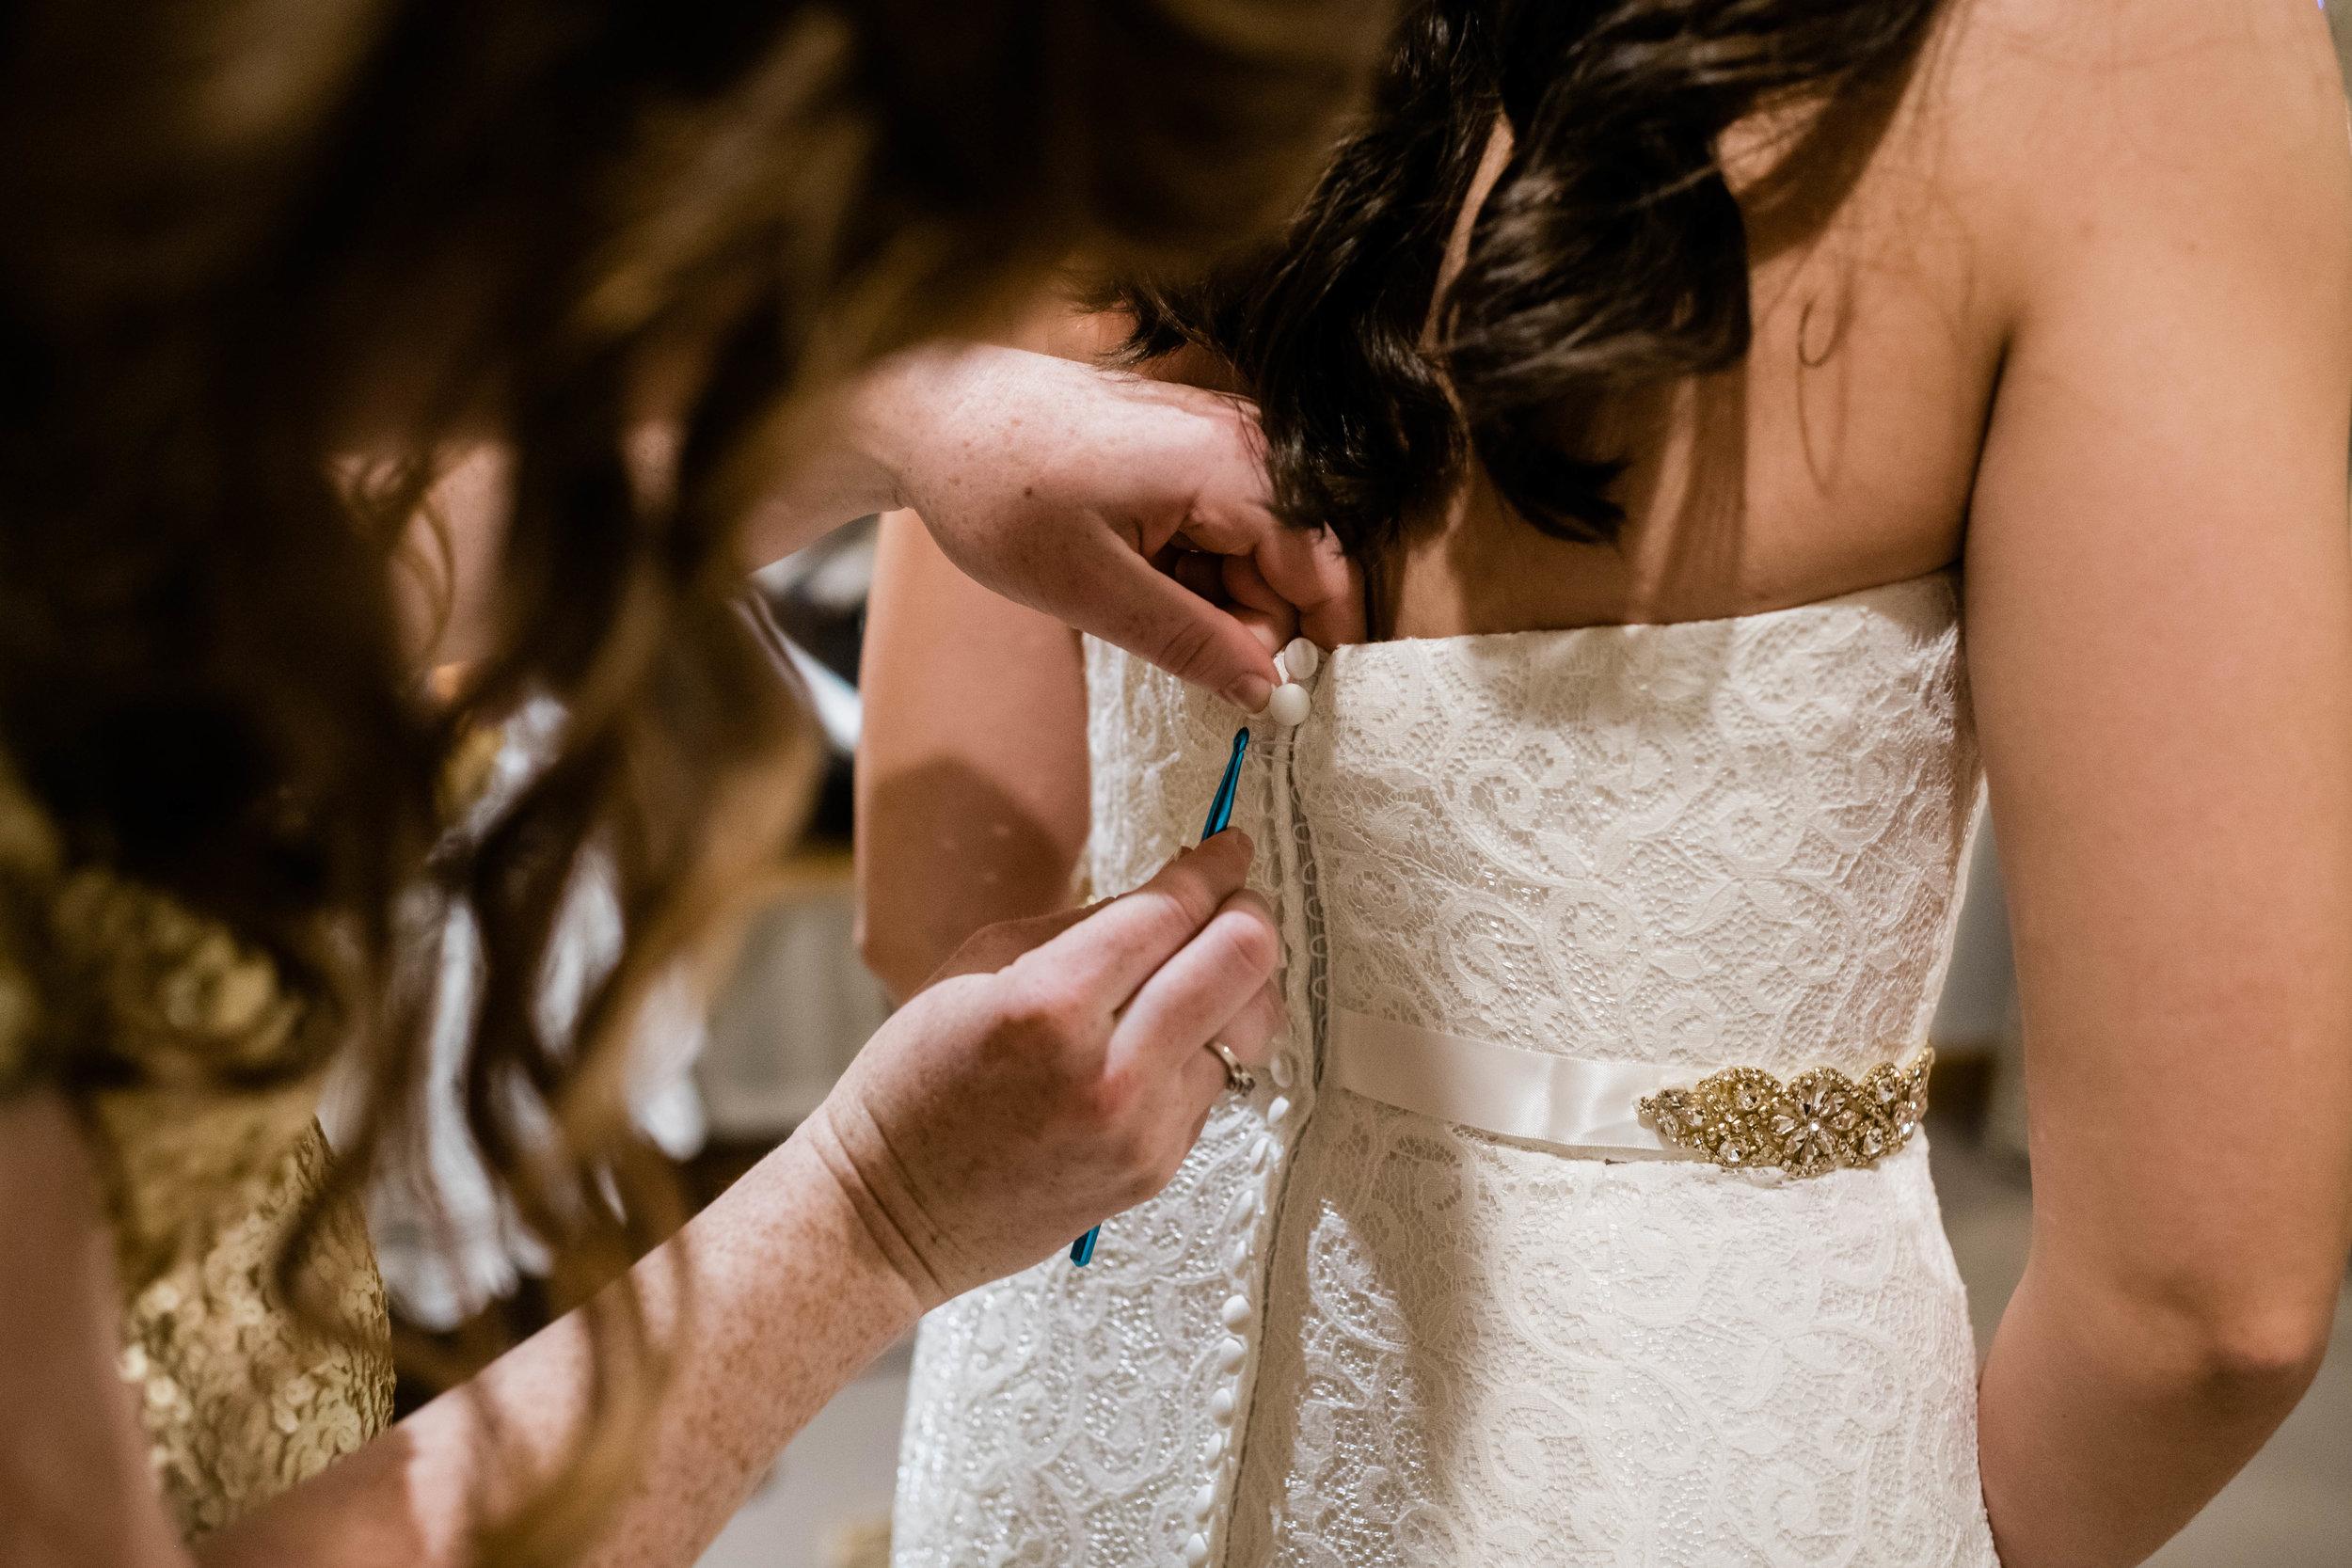 Bridesmaid using crochet hook to fasten bride's wedding dress